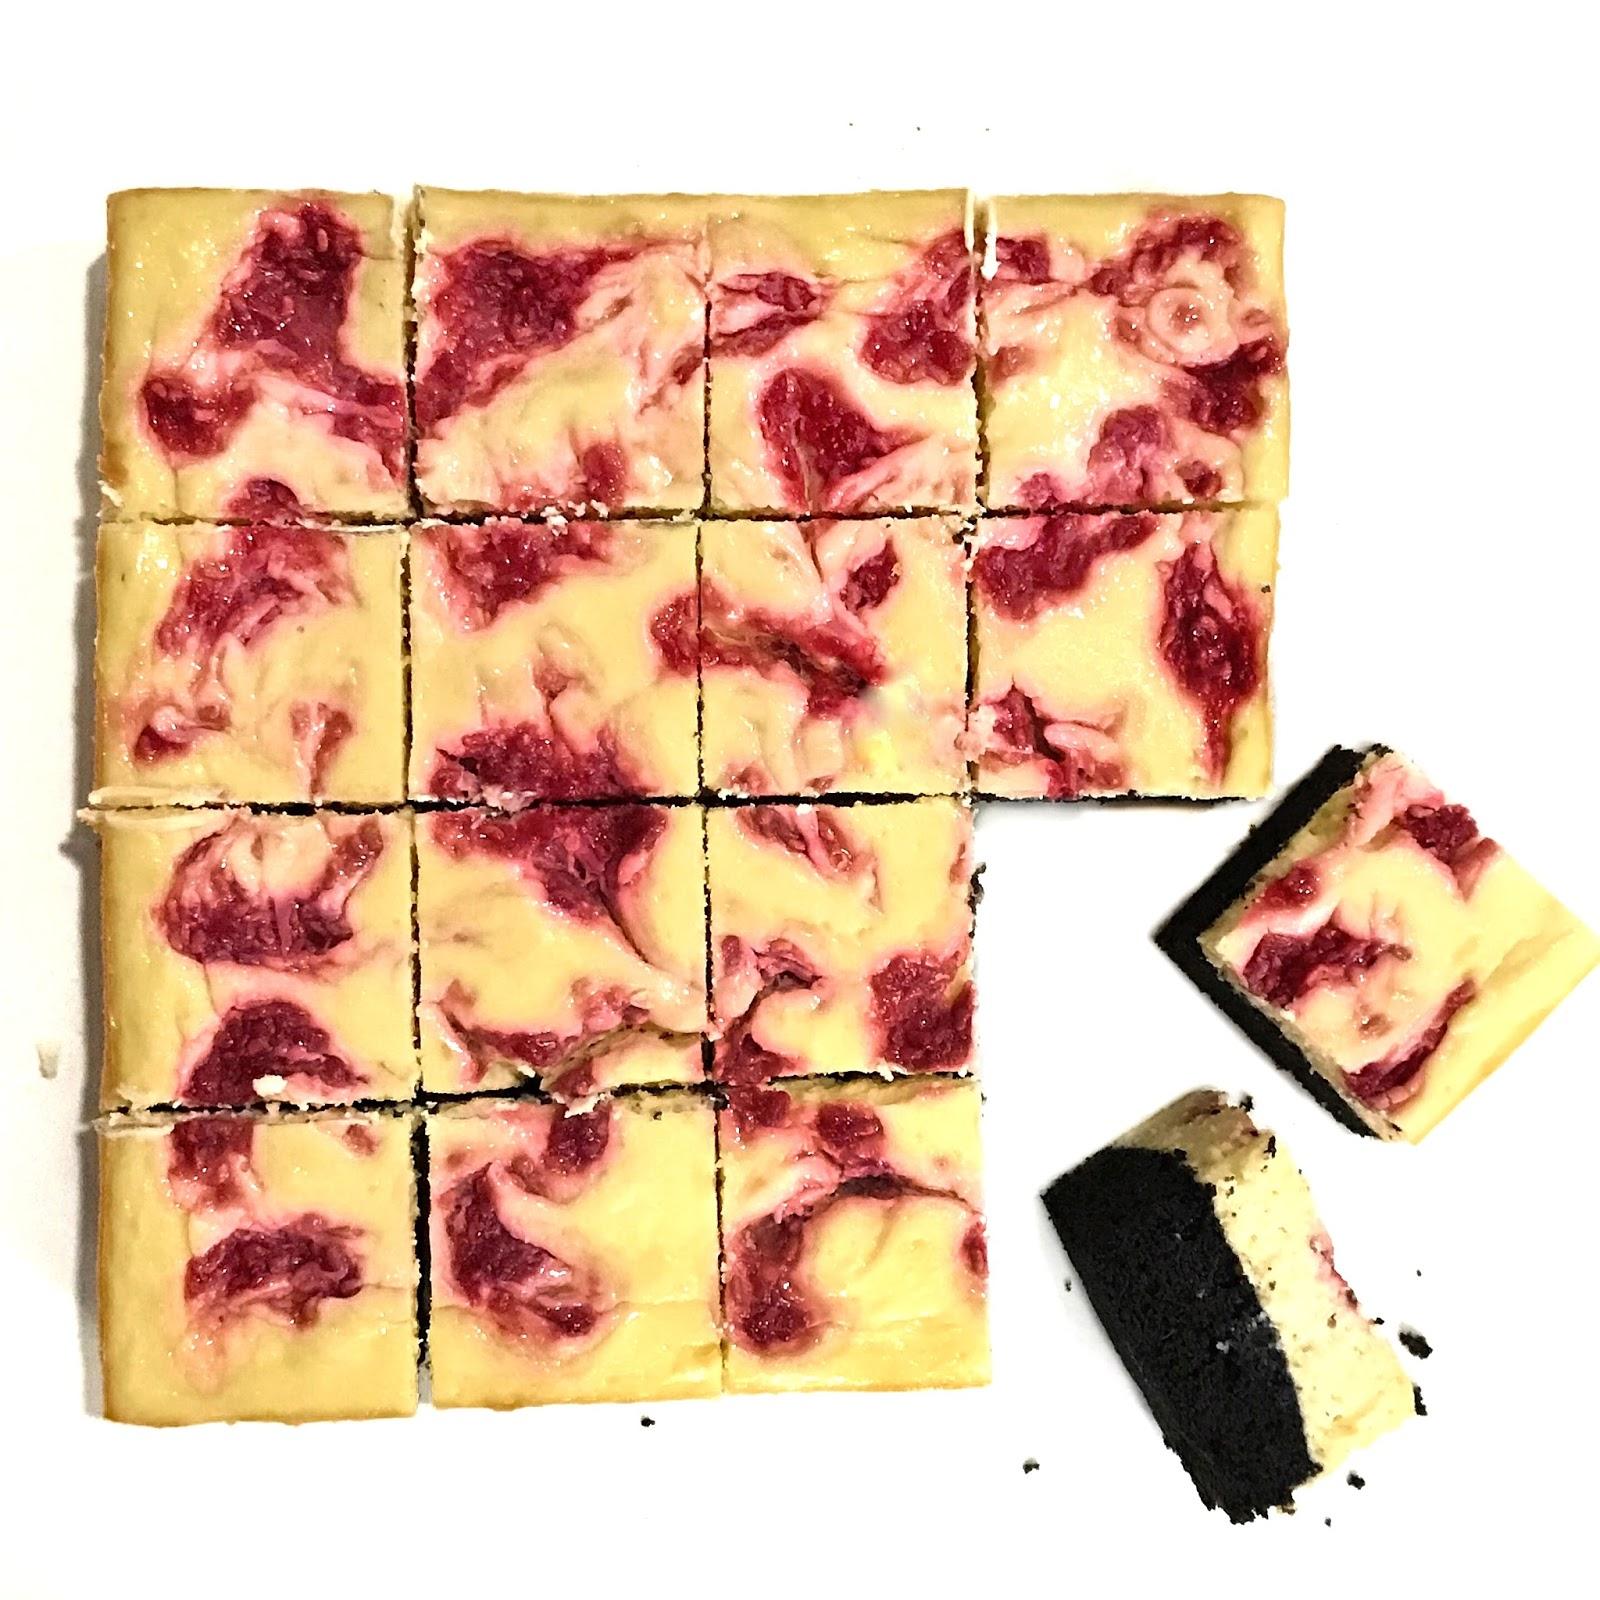 Raspberry Swirl Cheesecake Brownie